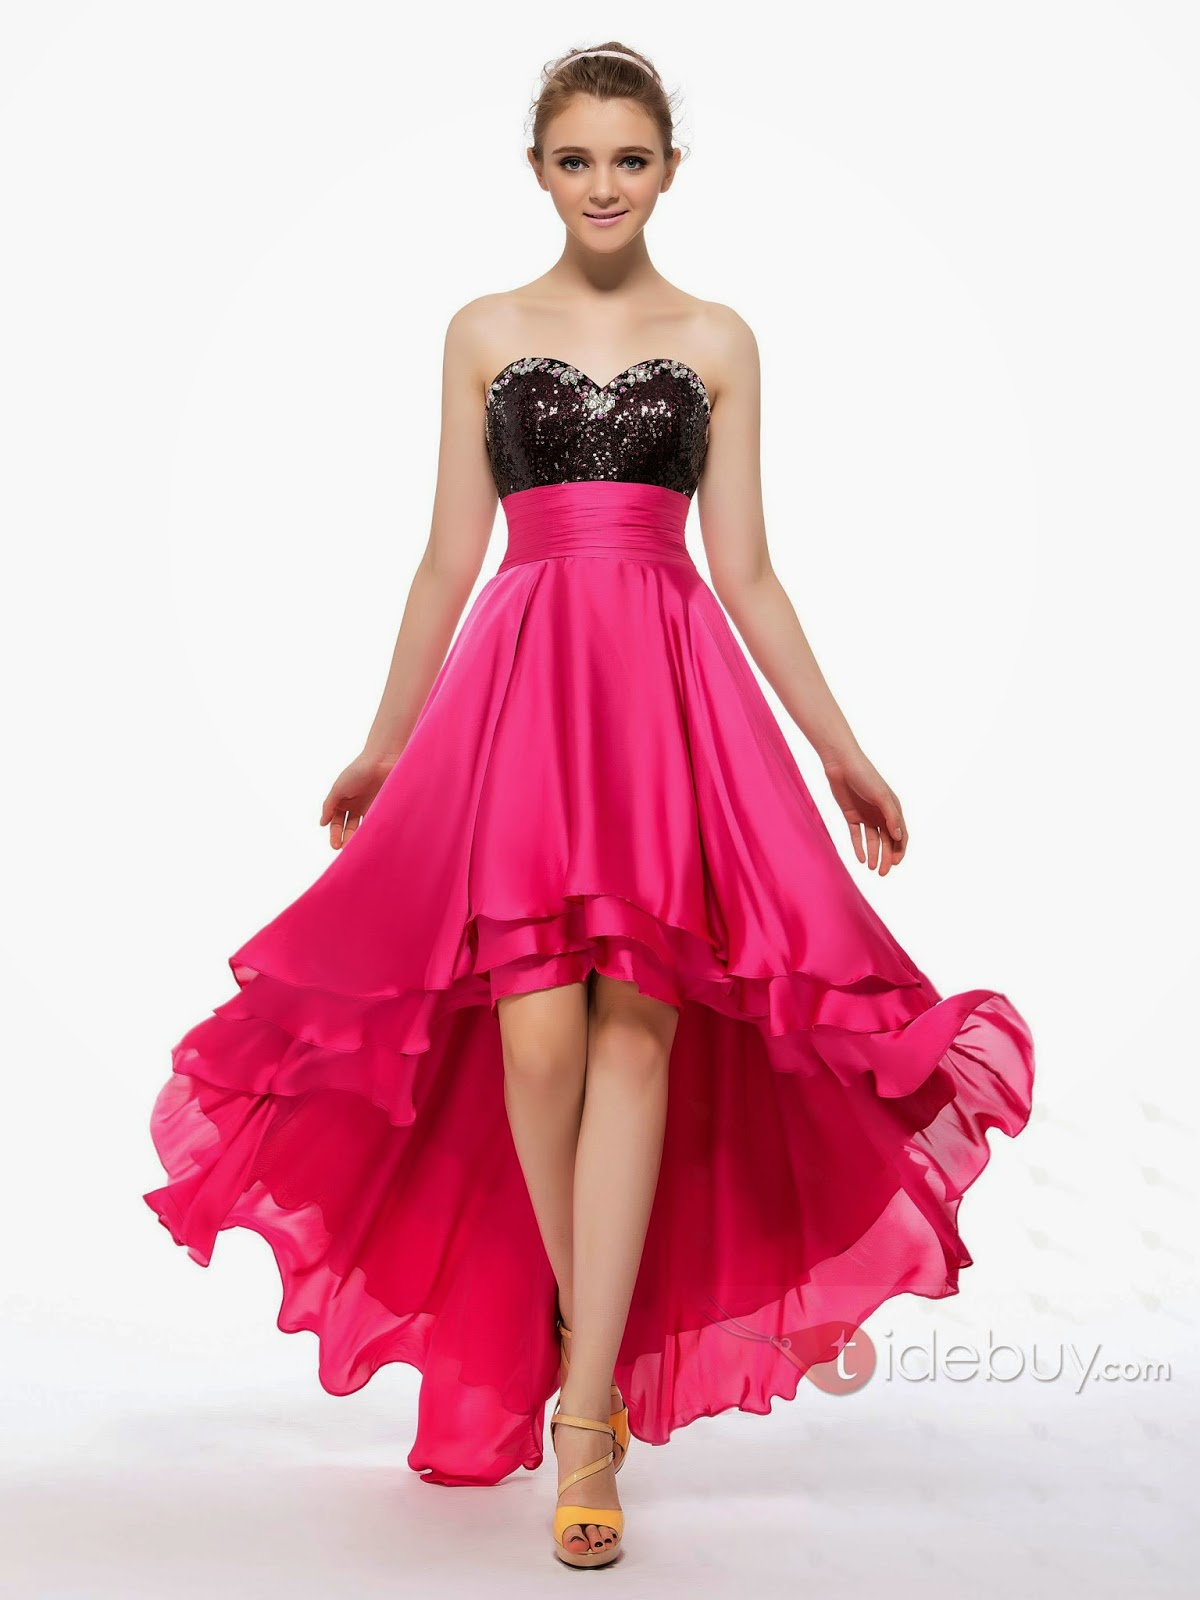 Kaiyo Aino Blog: Gorgeous Tidebuy Dresses